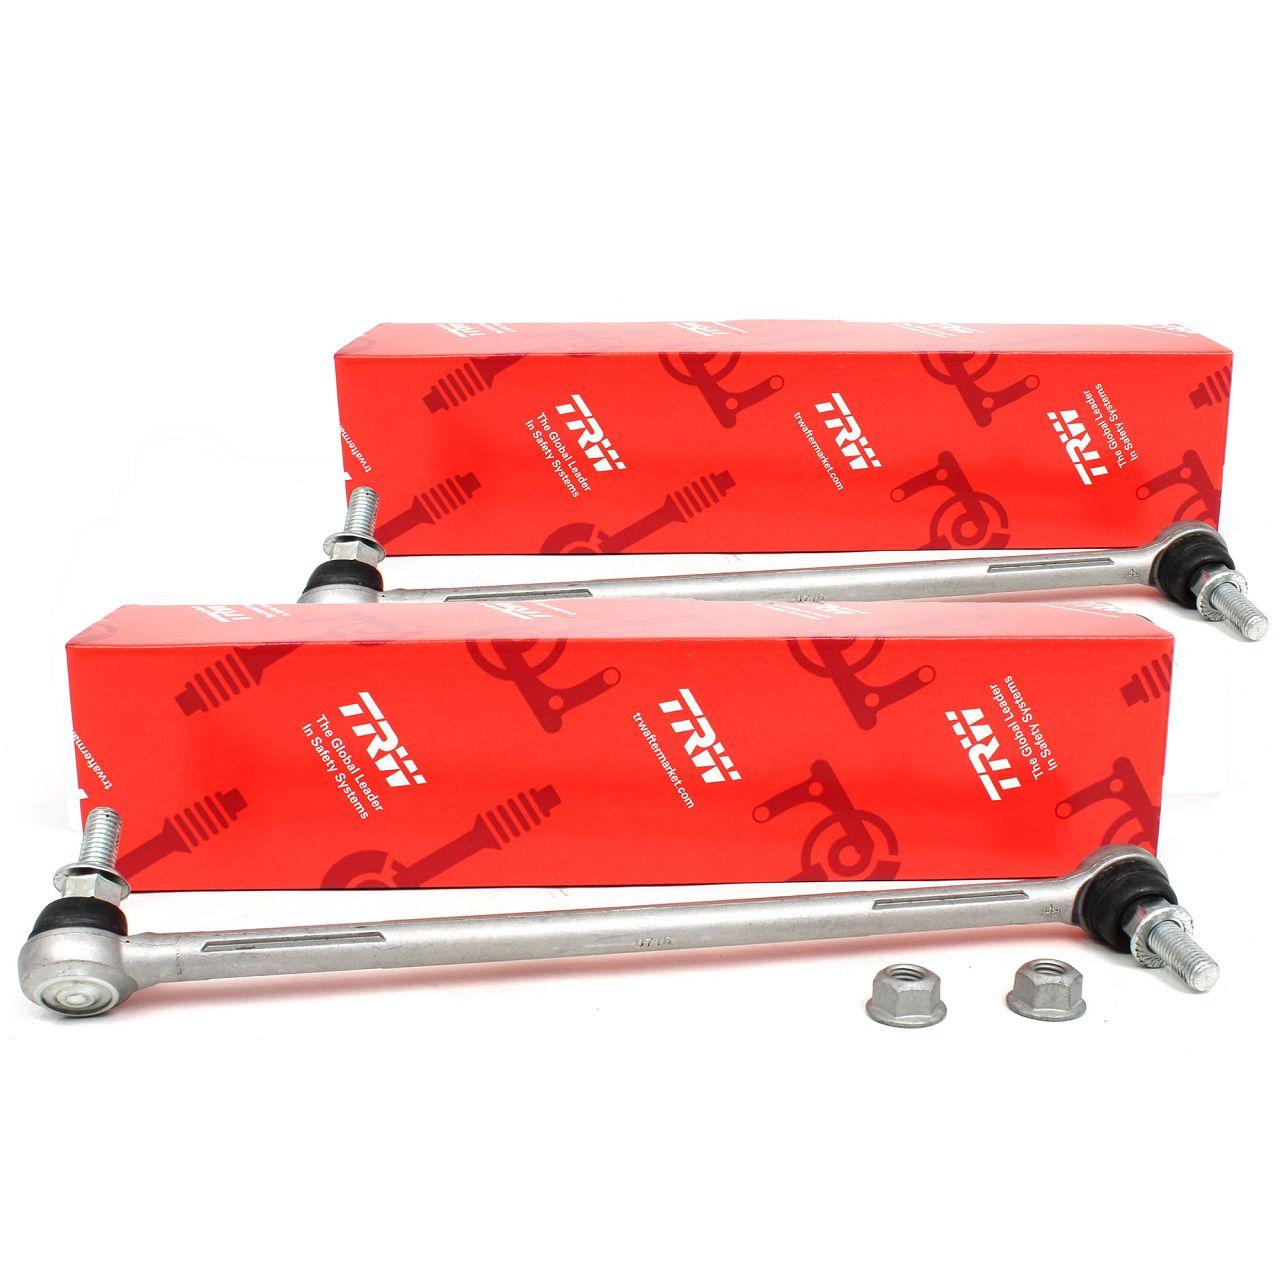 2x TRW Koppelstange Stabilisatorstange für BMW E81-88 E90-93 X1 E84 Z4 E89 vorne